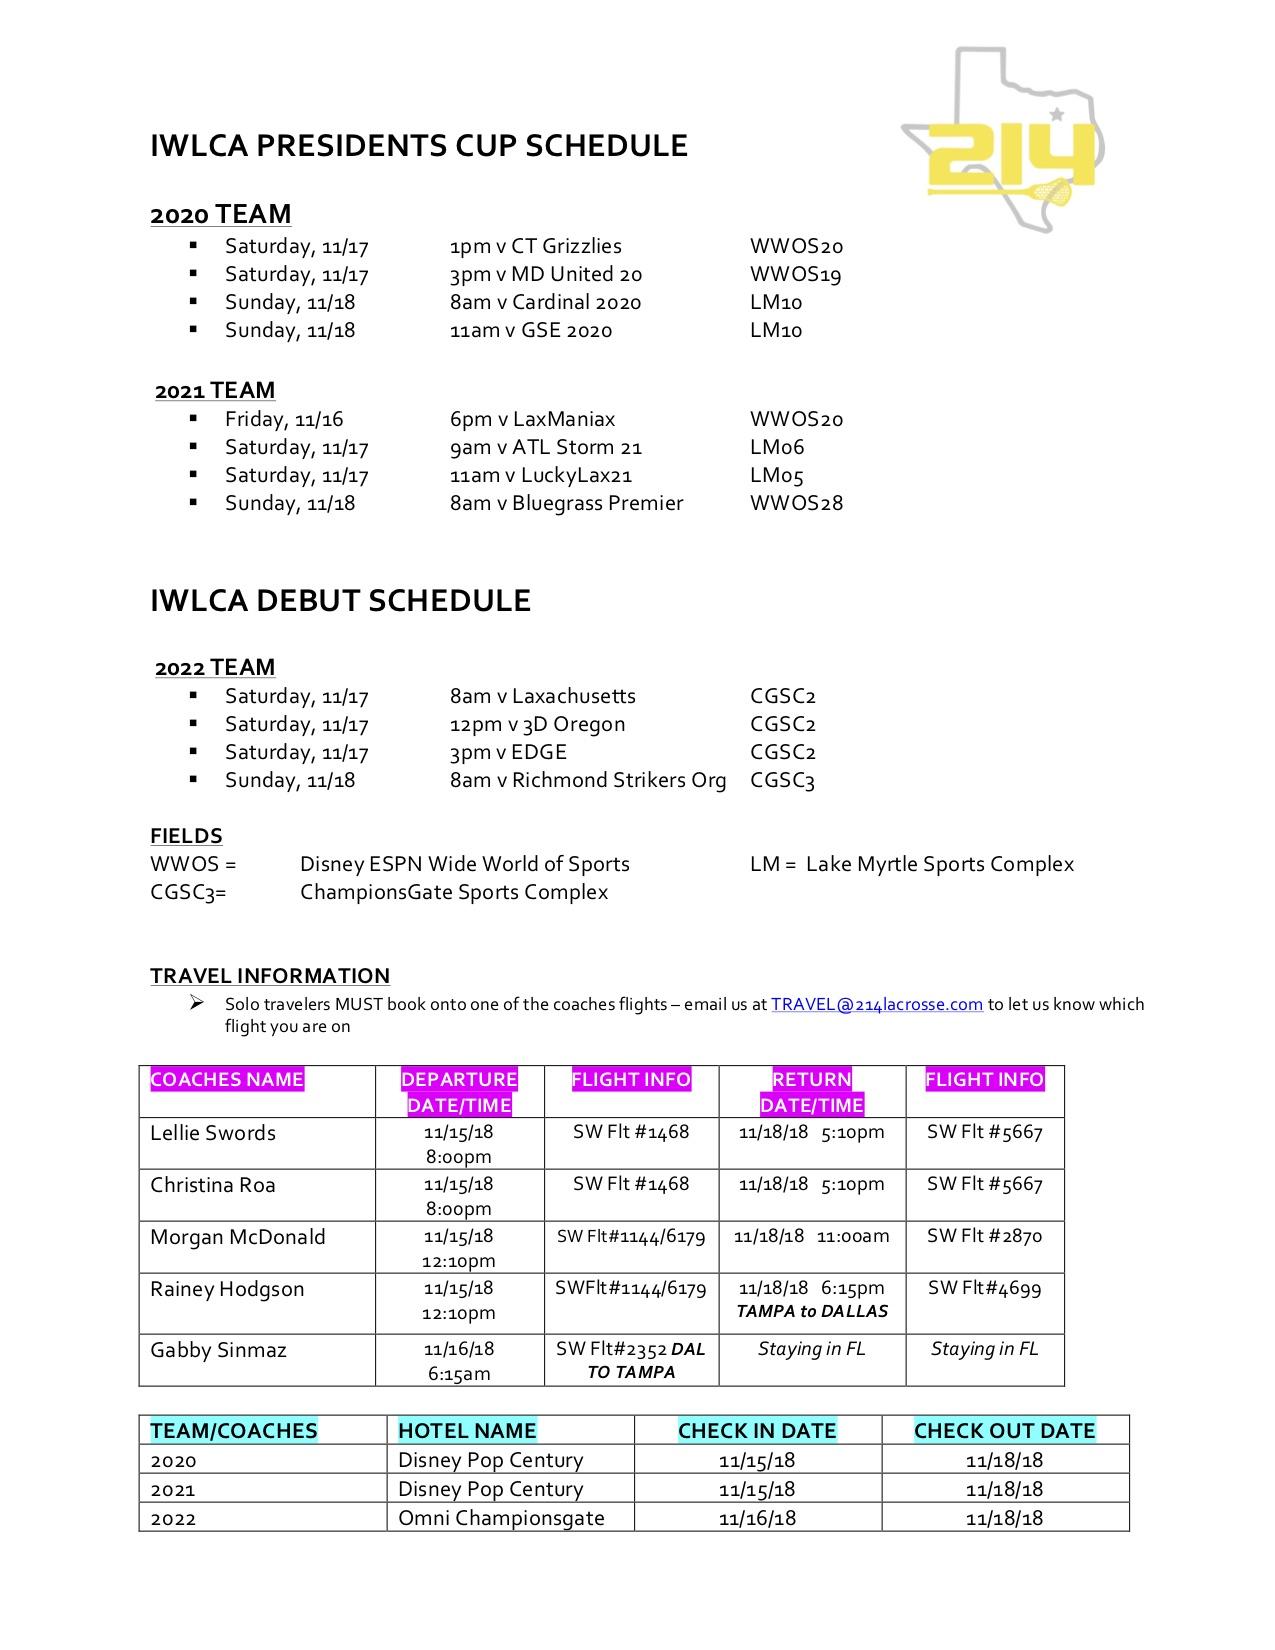 FLORIDA SCHEDULE 20.21.22 v2.jpg